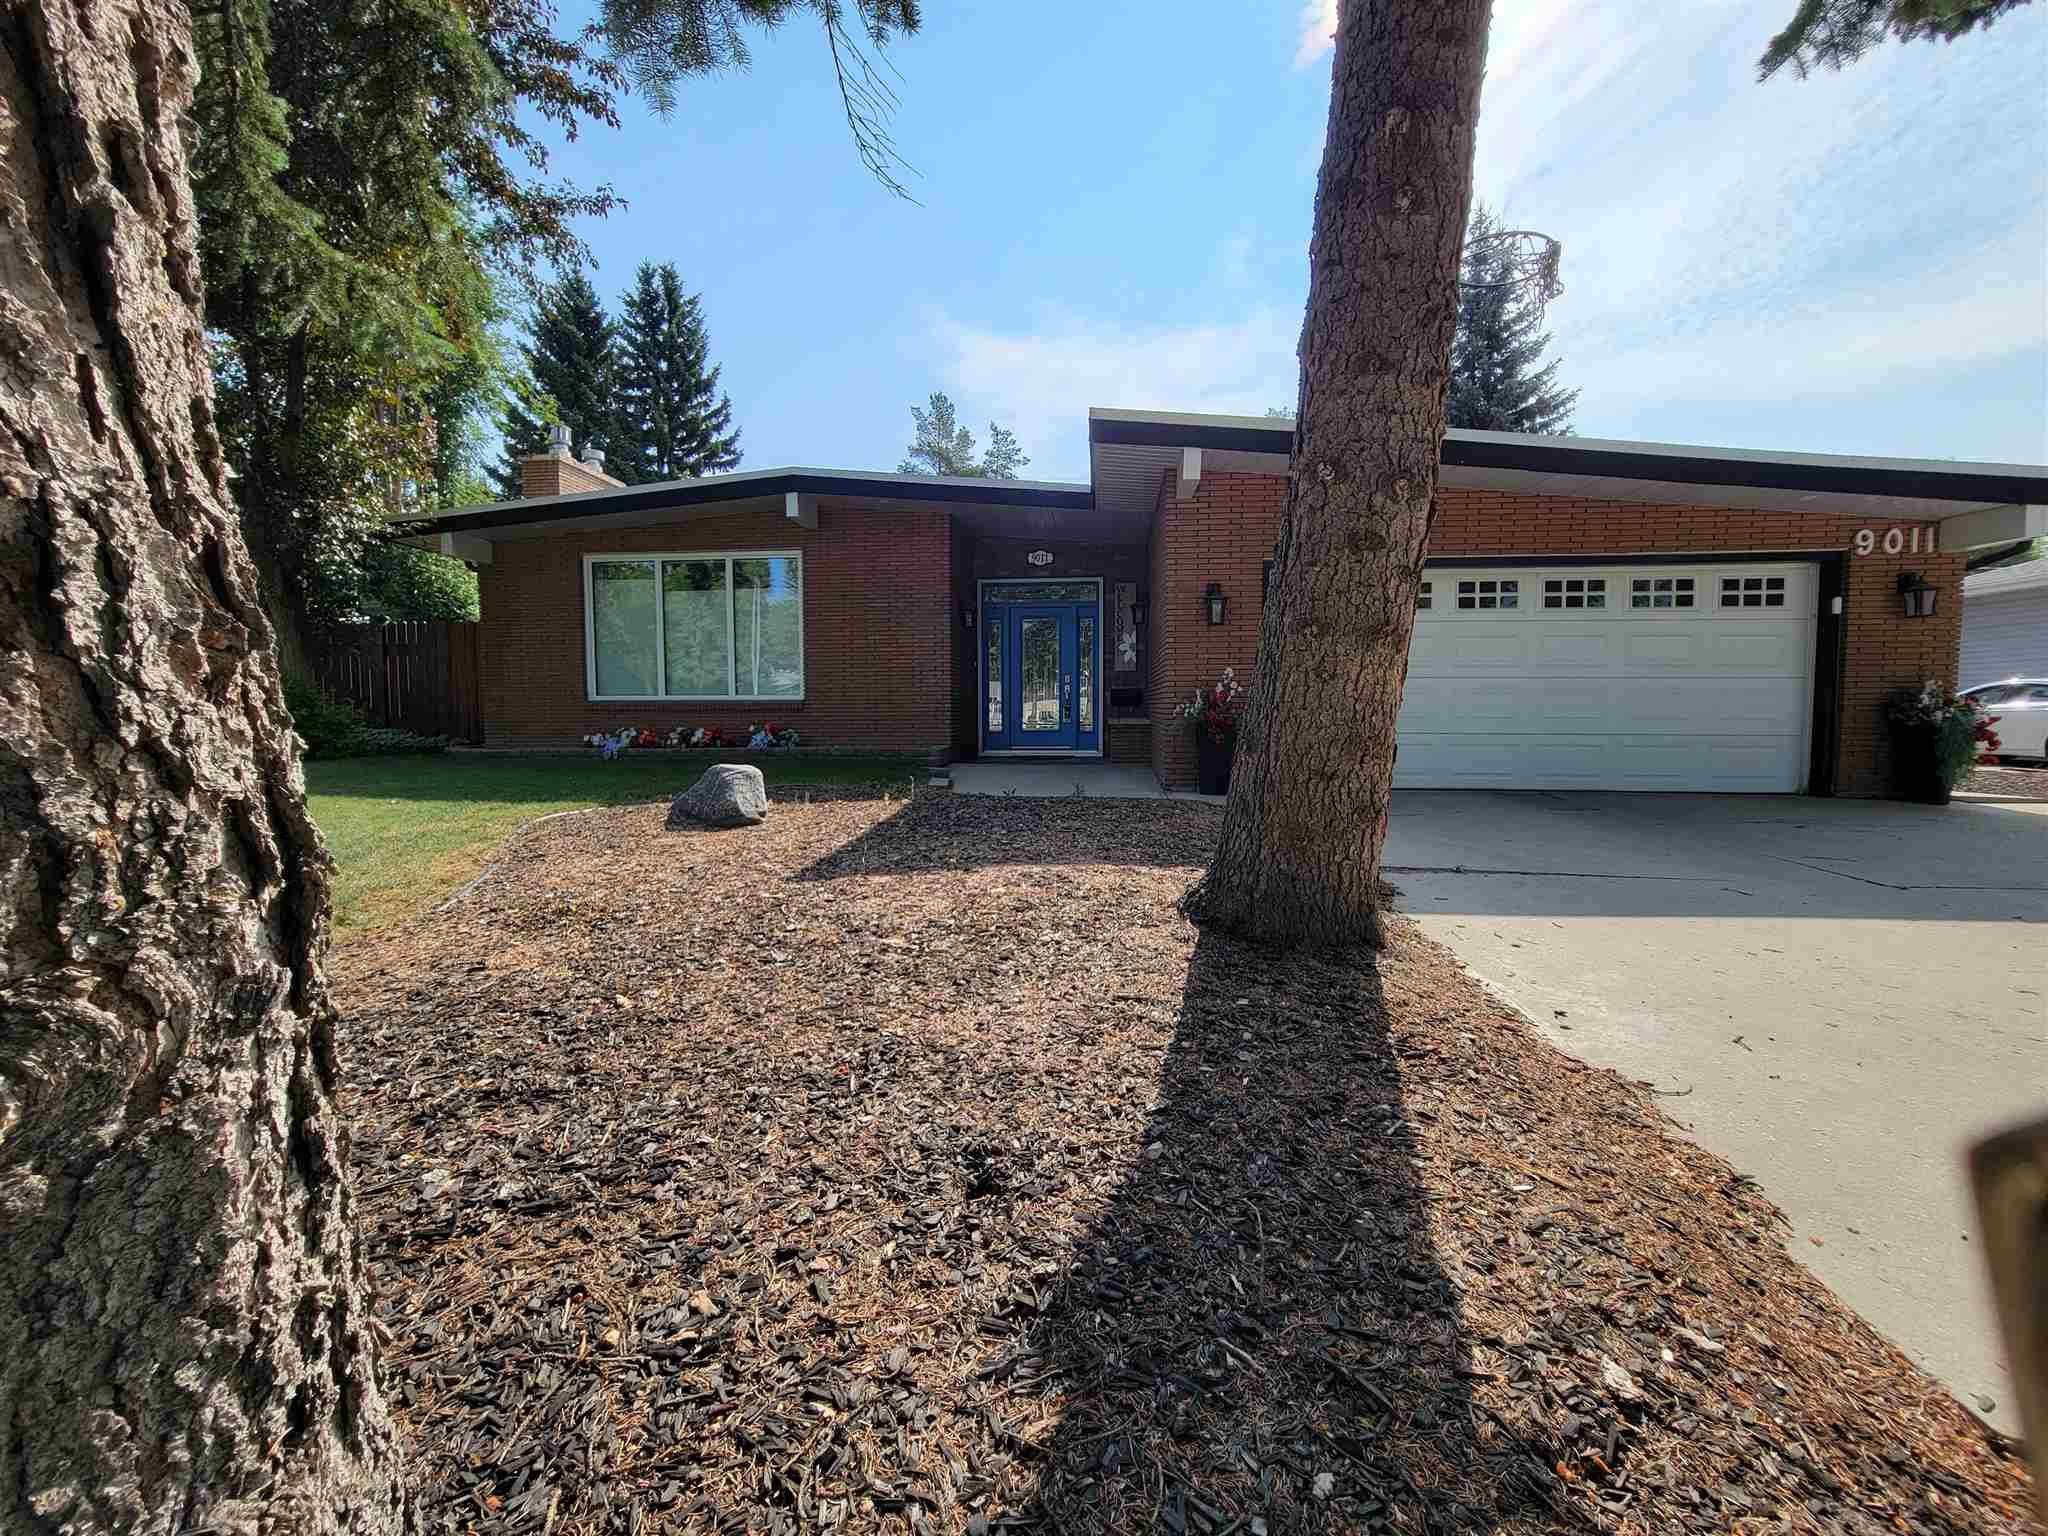 Main Photo: 9011 142 Street in Edmonton: Zone 10 House for sale : MLS®# E4254484